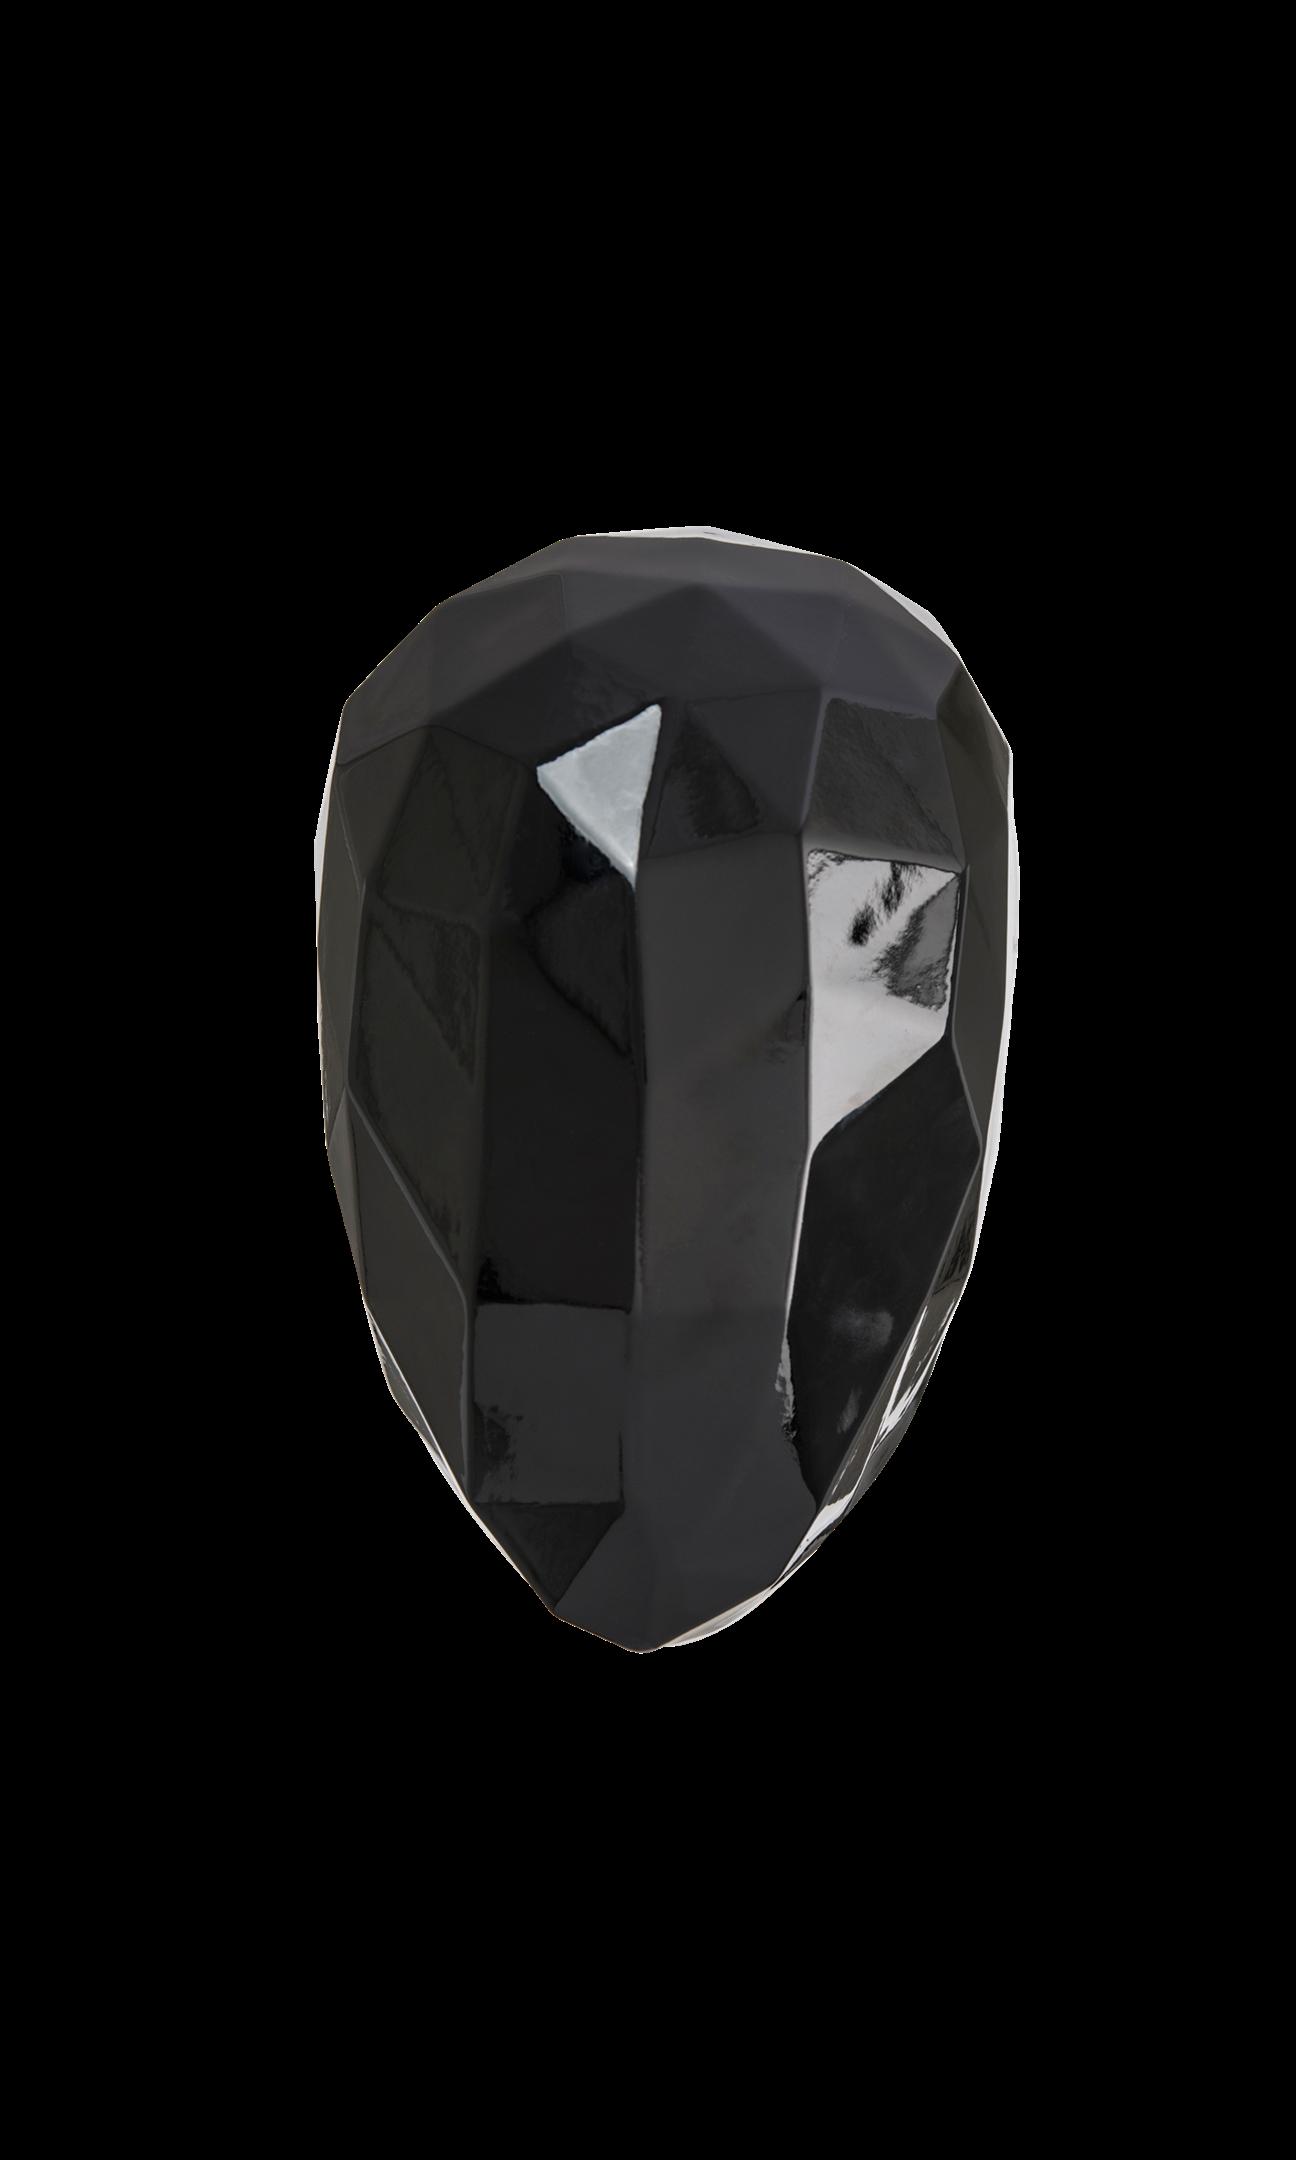 ABSF4/BLACKGLOSS